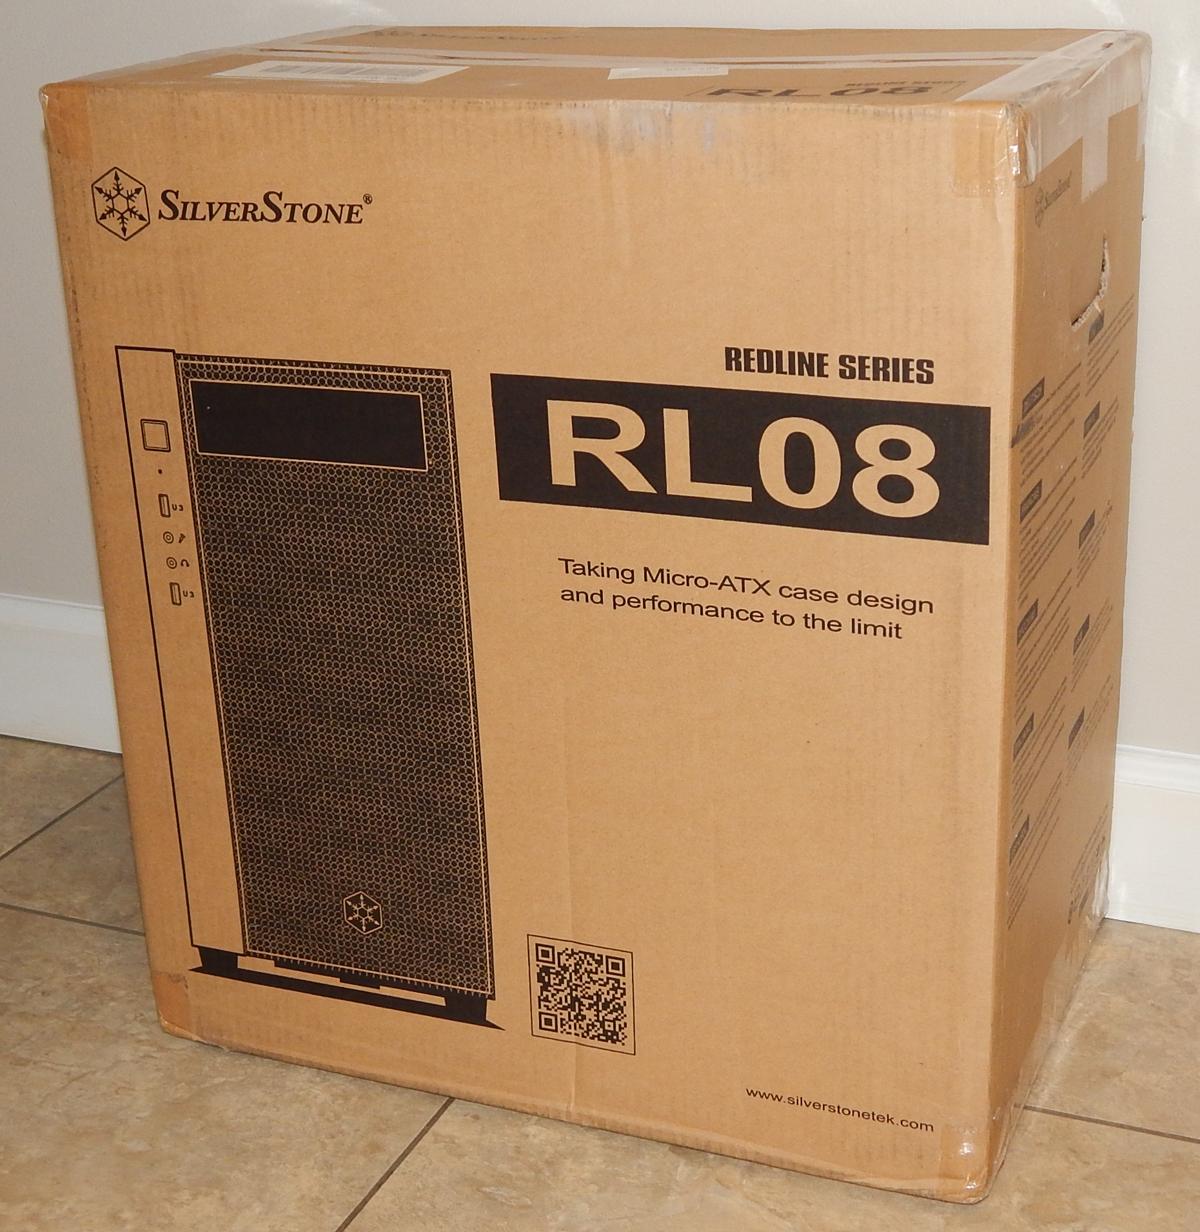 SilverStone RL08 Box